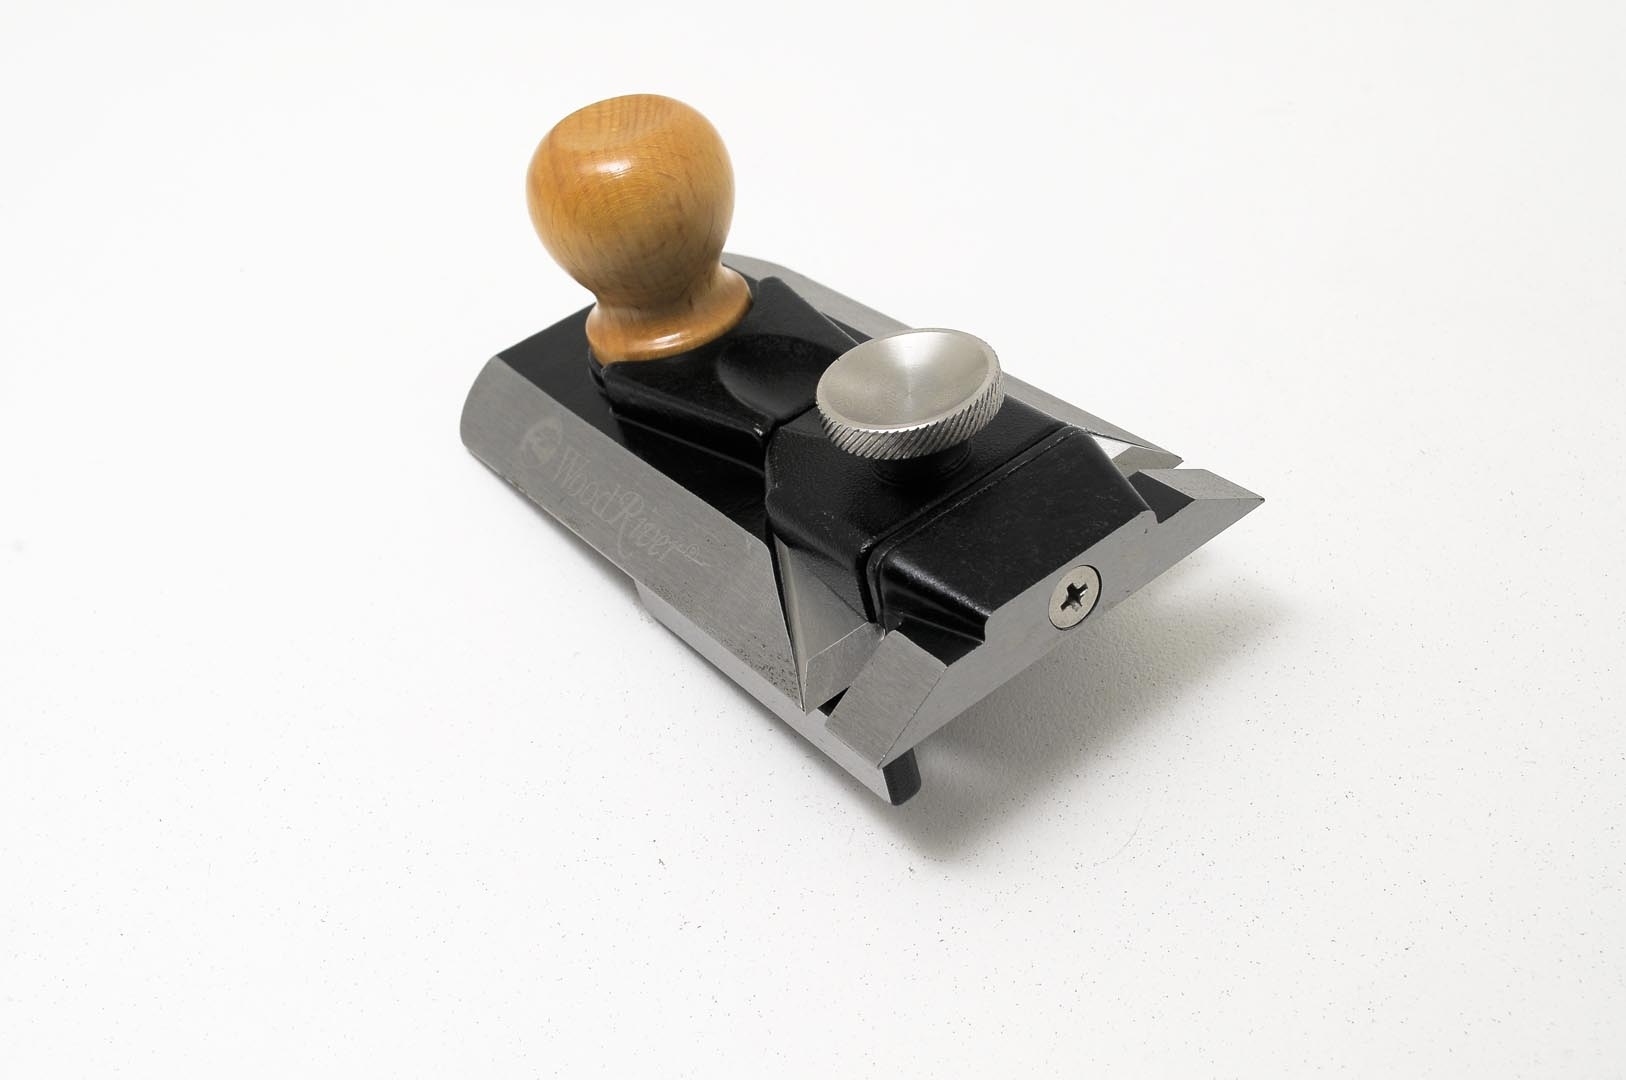 151239-Cepillo limpia canaleta rebaja machihembrado WoodRiver 151239-max-2.